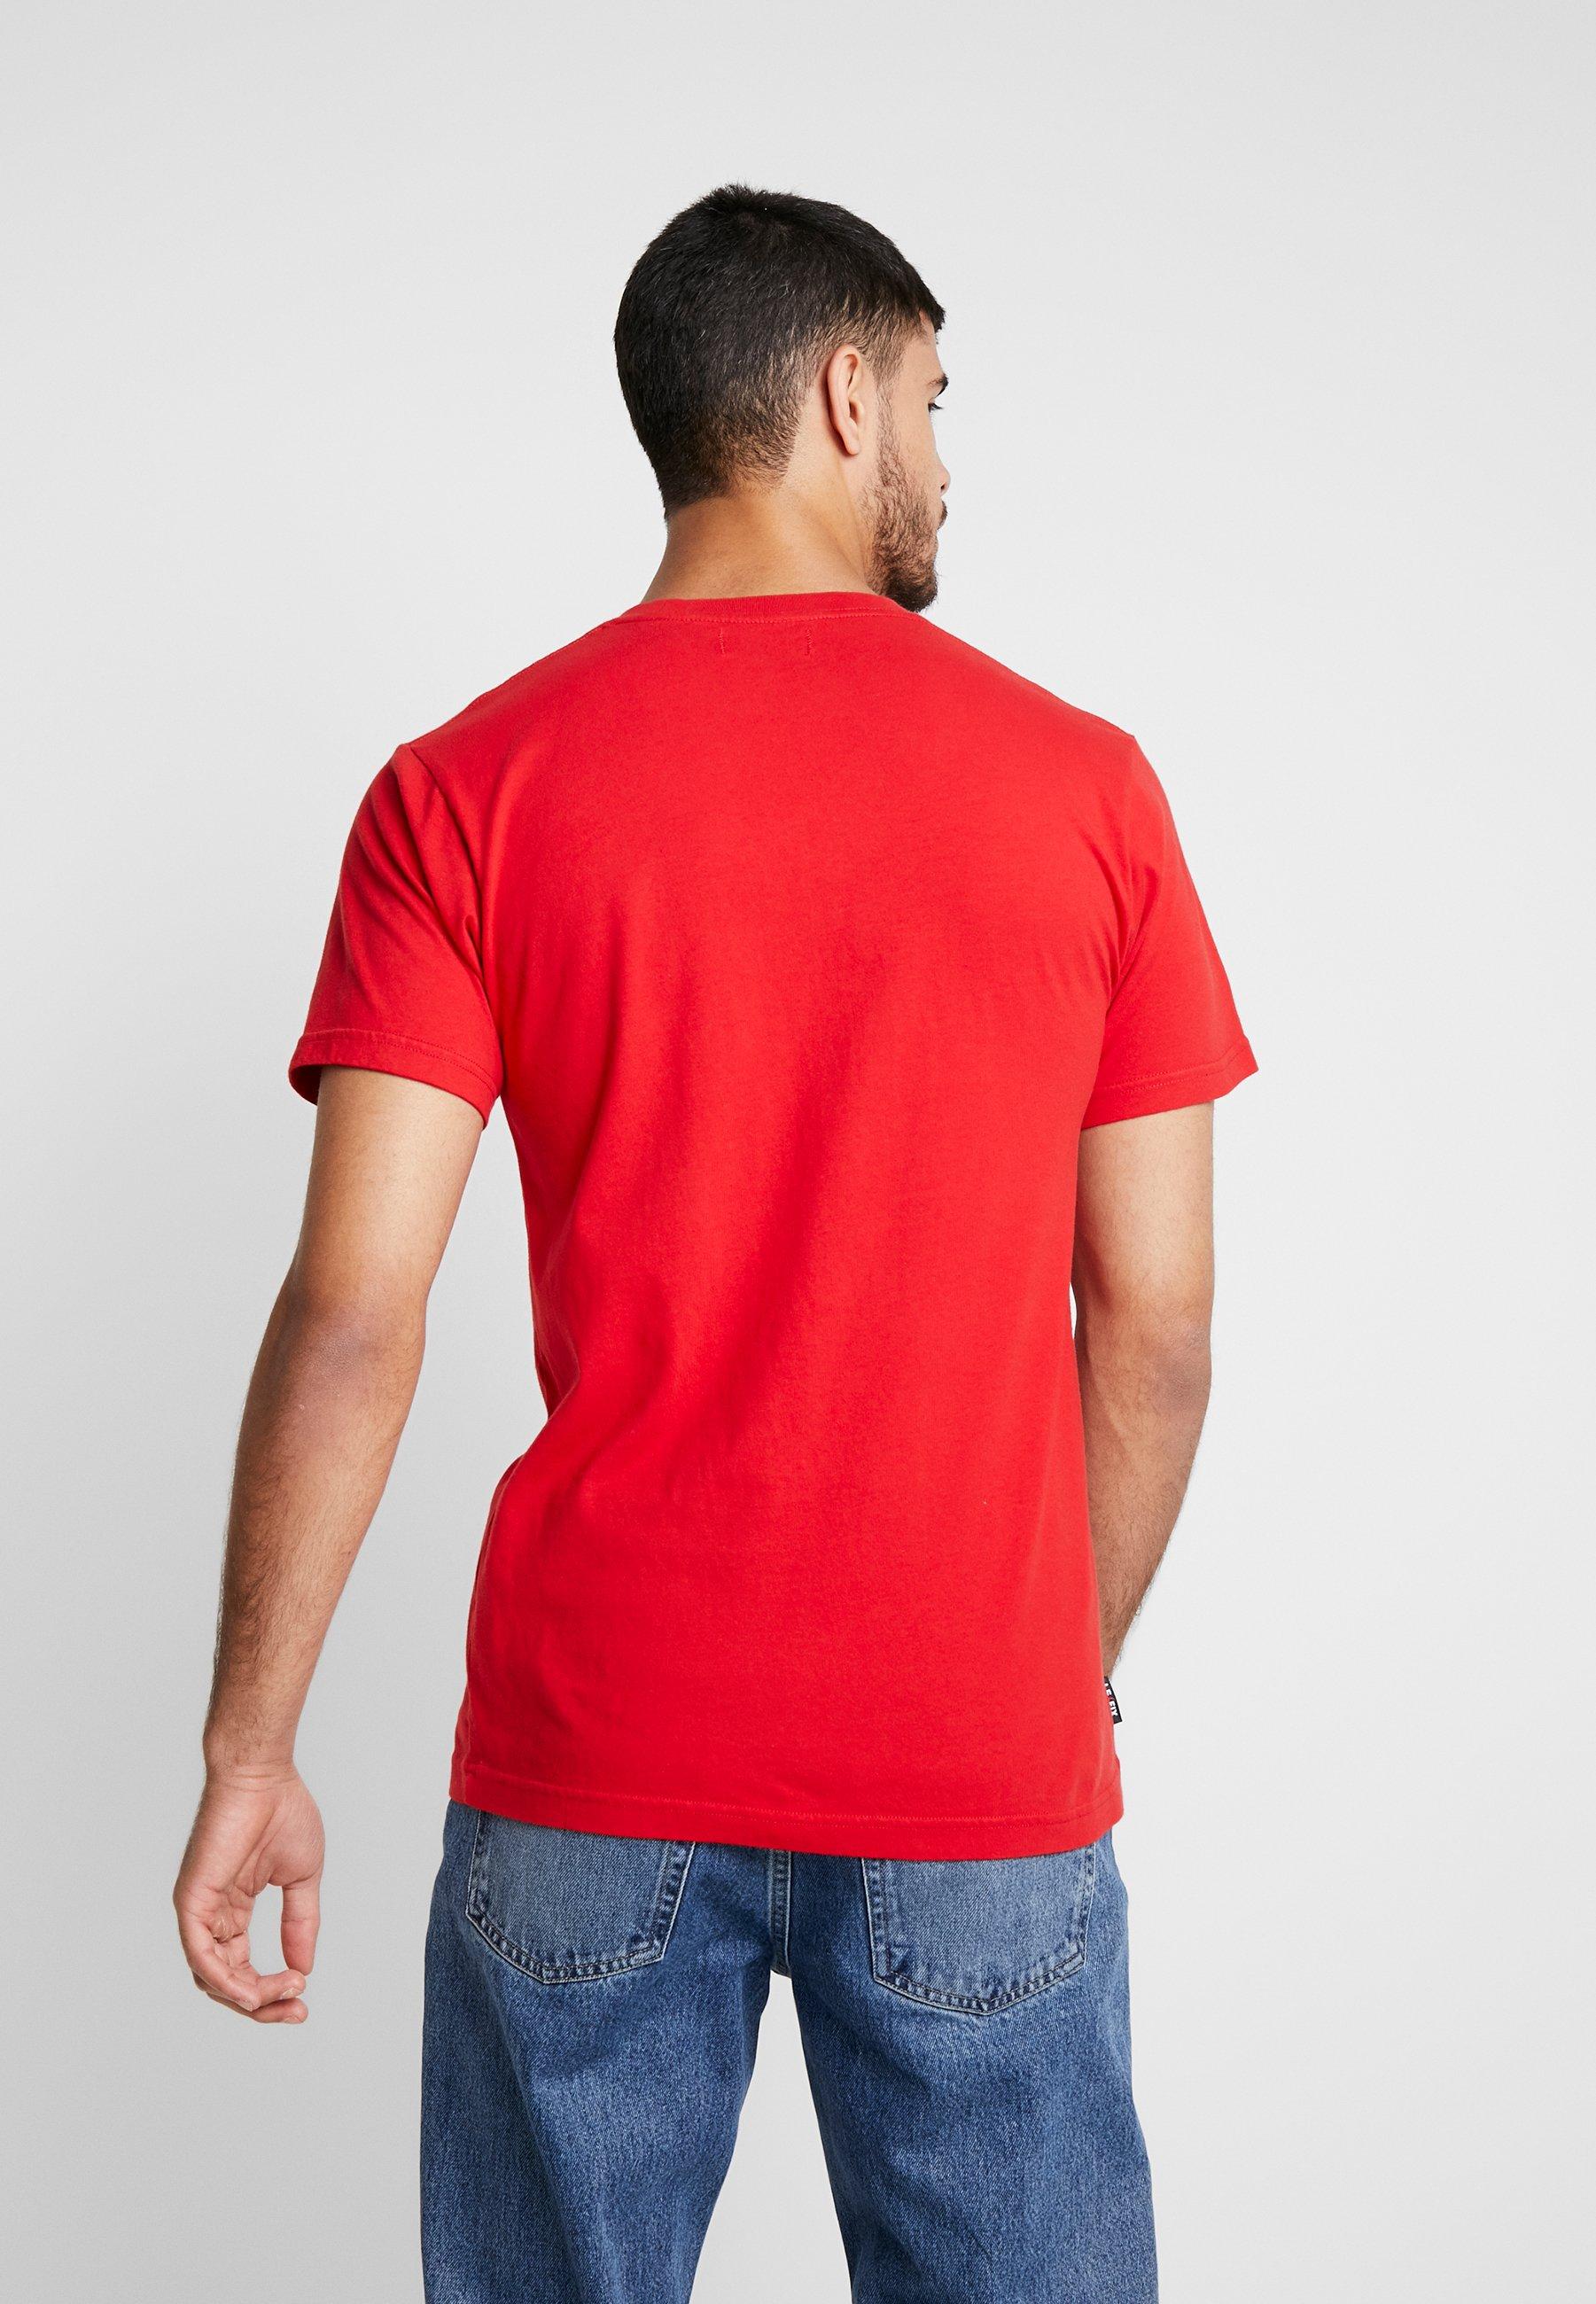 Fix TeeT shirt Letters Le Red Imprimé Jumping N0yPv8nOmw